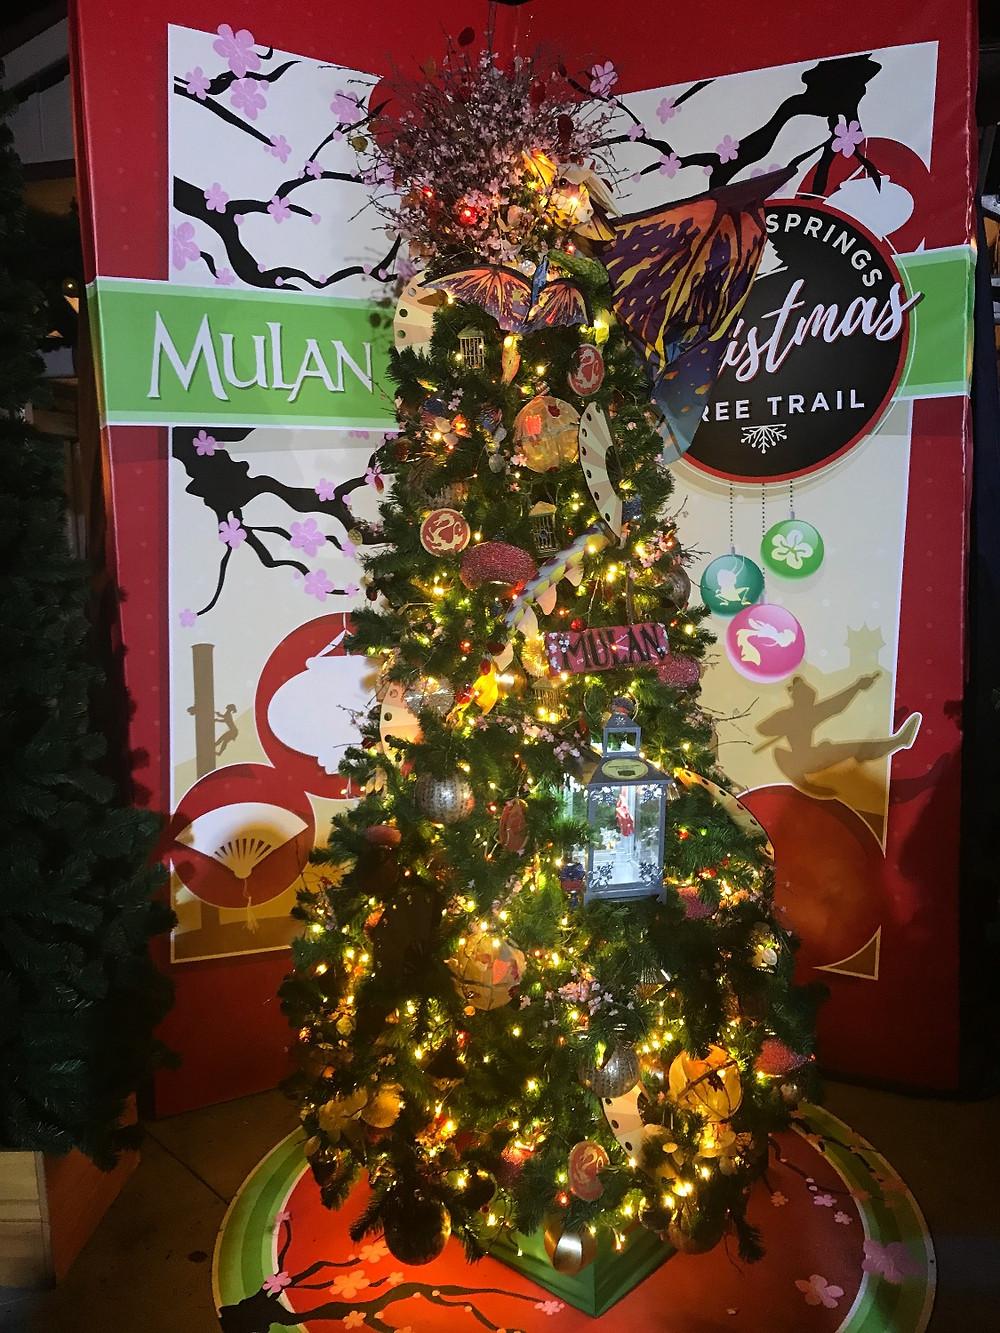 Katrina Belle - Katrina Belle Beauty - Orlando fashion blogger - Disney blogger - Disney Springs - Disney Christmas Trees